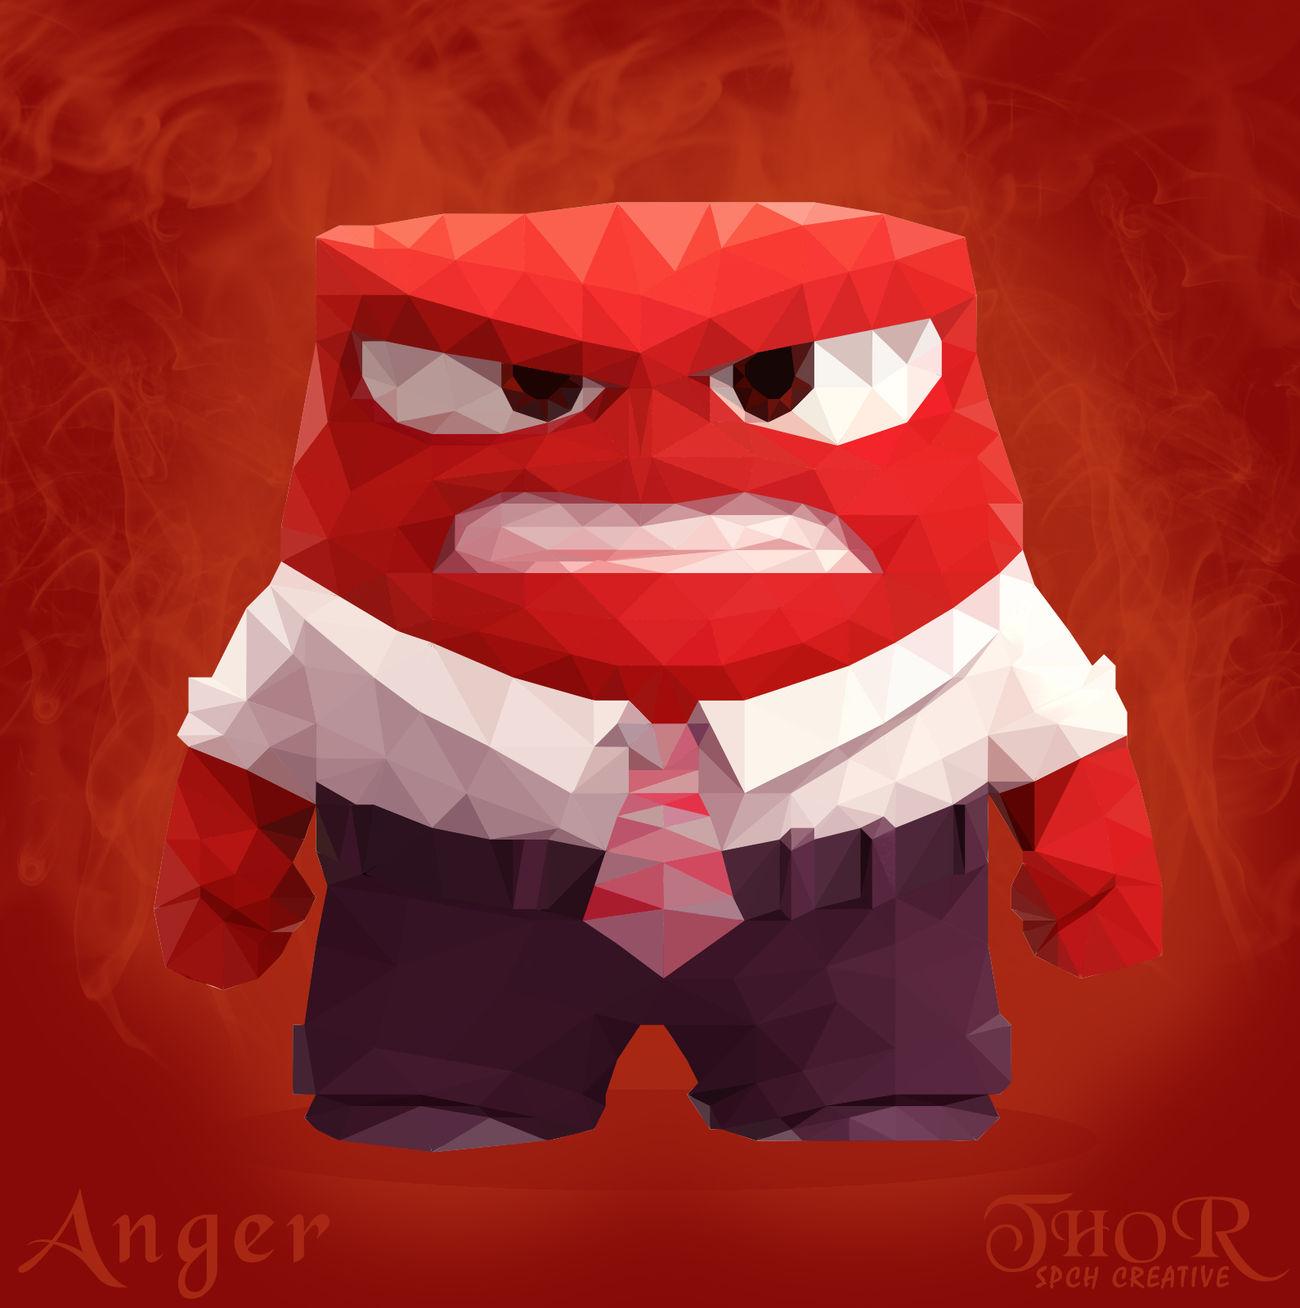 Anger Cartoons Inside Out Photo Photos Picture SPCHcreative Thai Thailand Thailand_allshots Thor